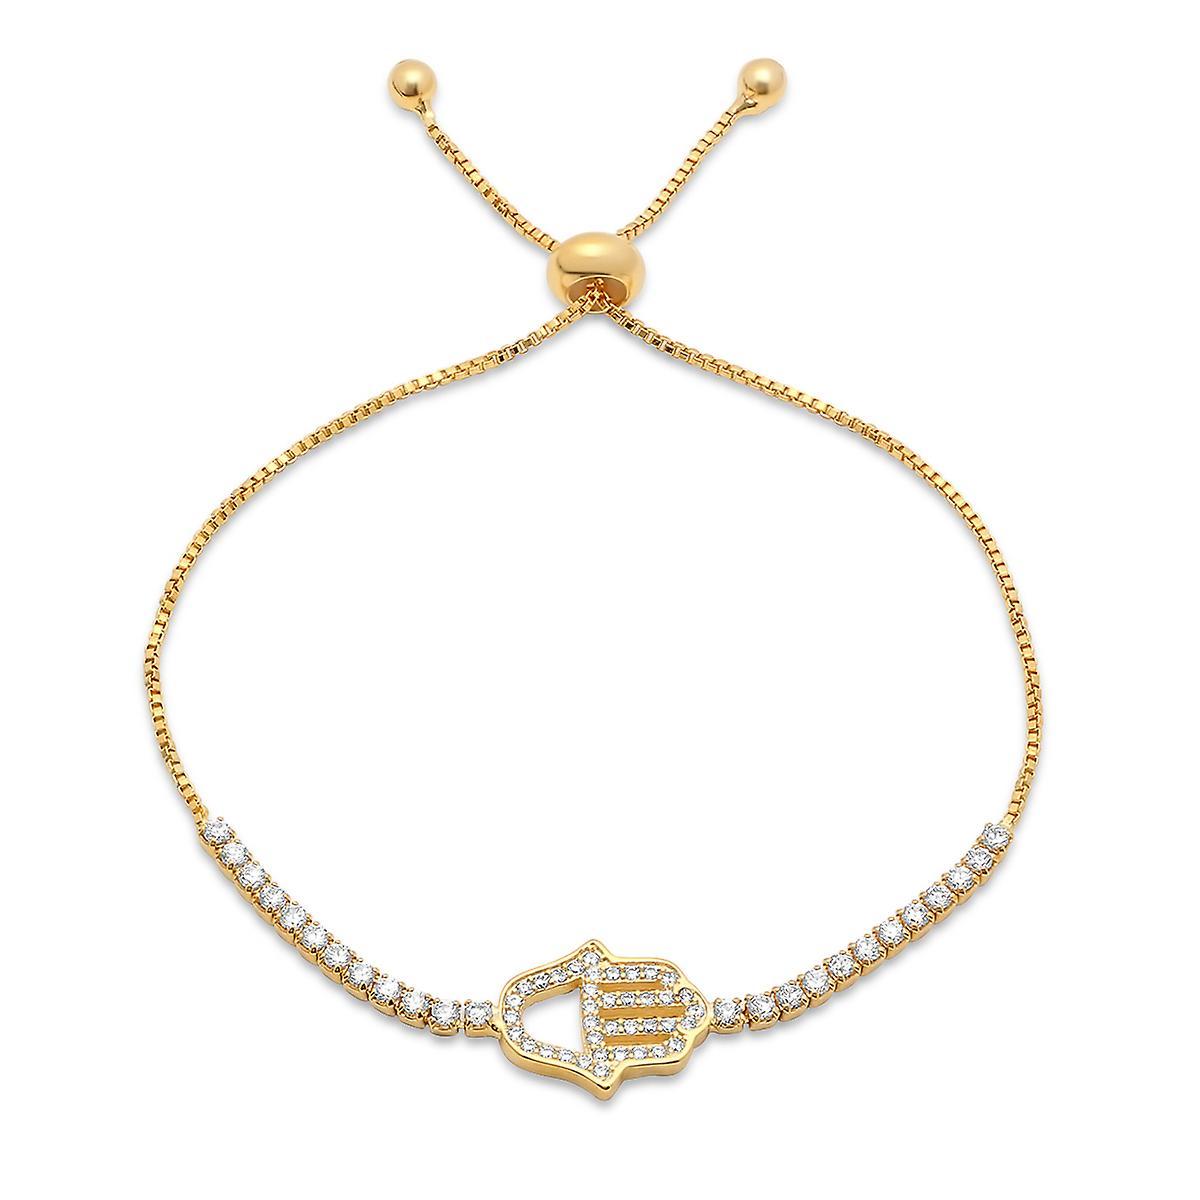 Ladies 18K Gold Plated Brass Simulated Drawstring Bracelet